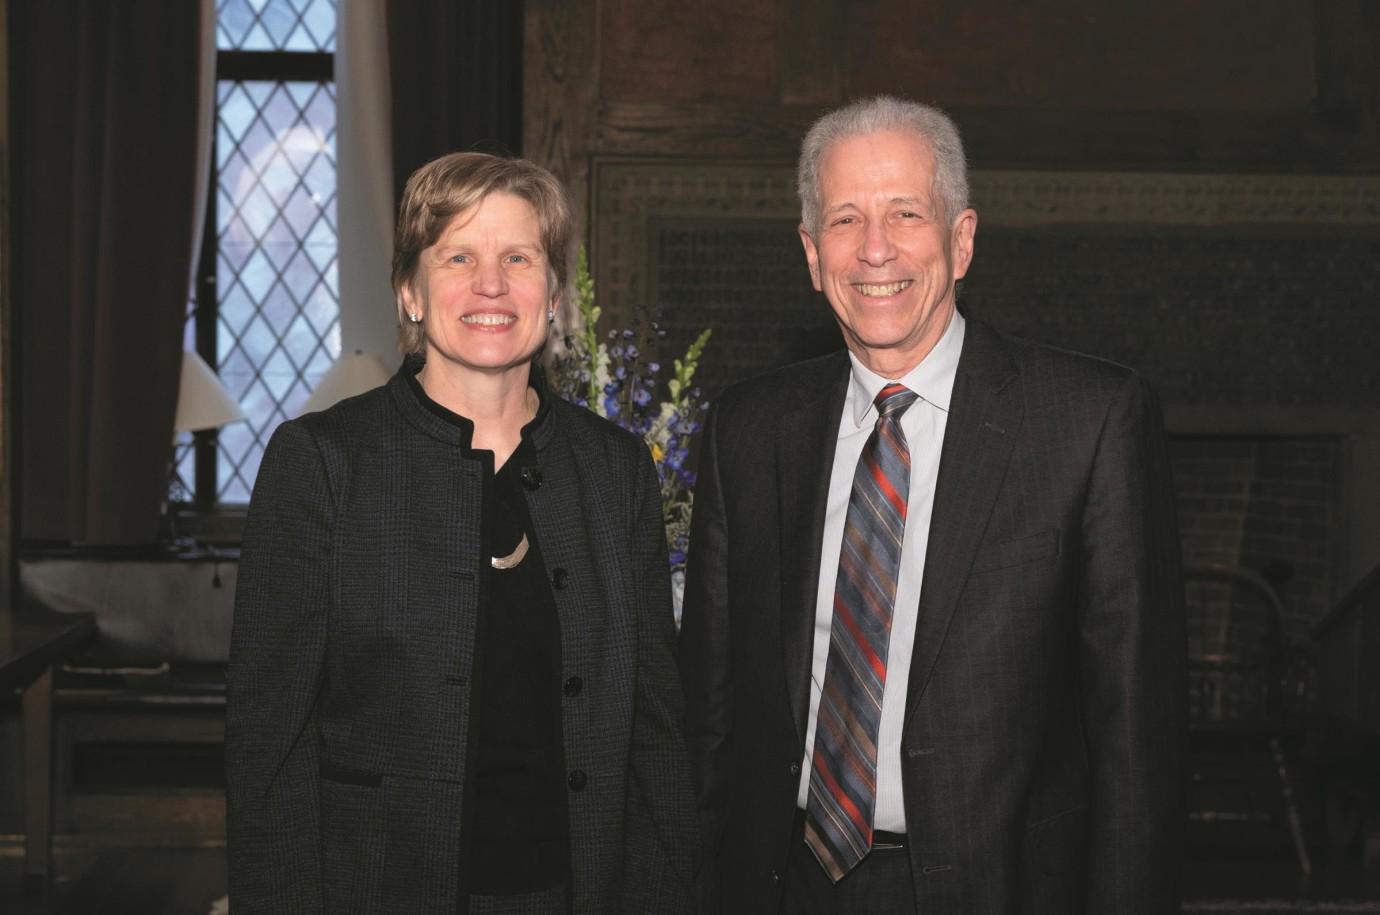 Dean Nancy J. Brown, MD, with former dean Robert J. Alpern, MD